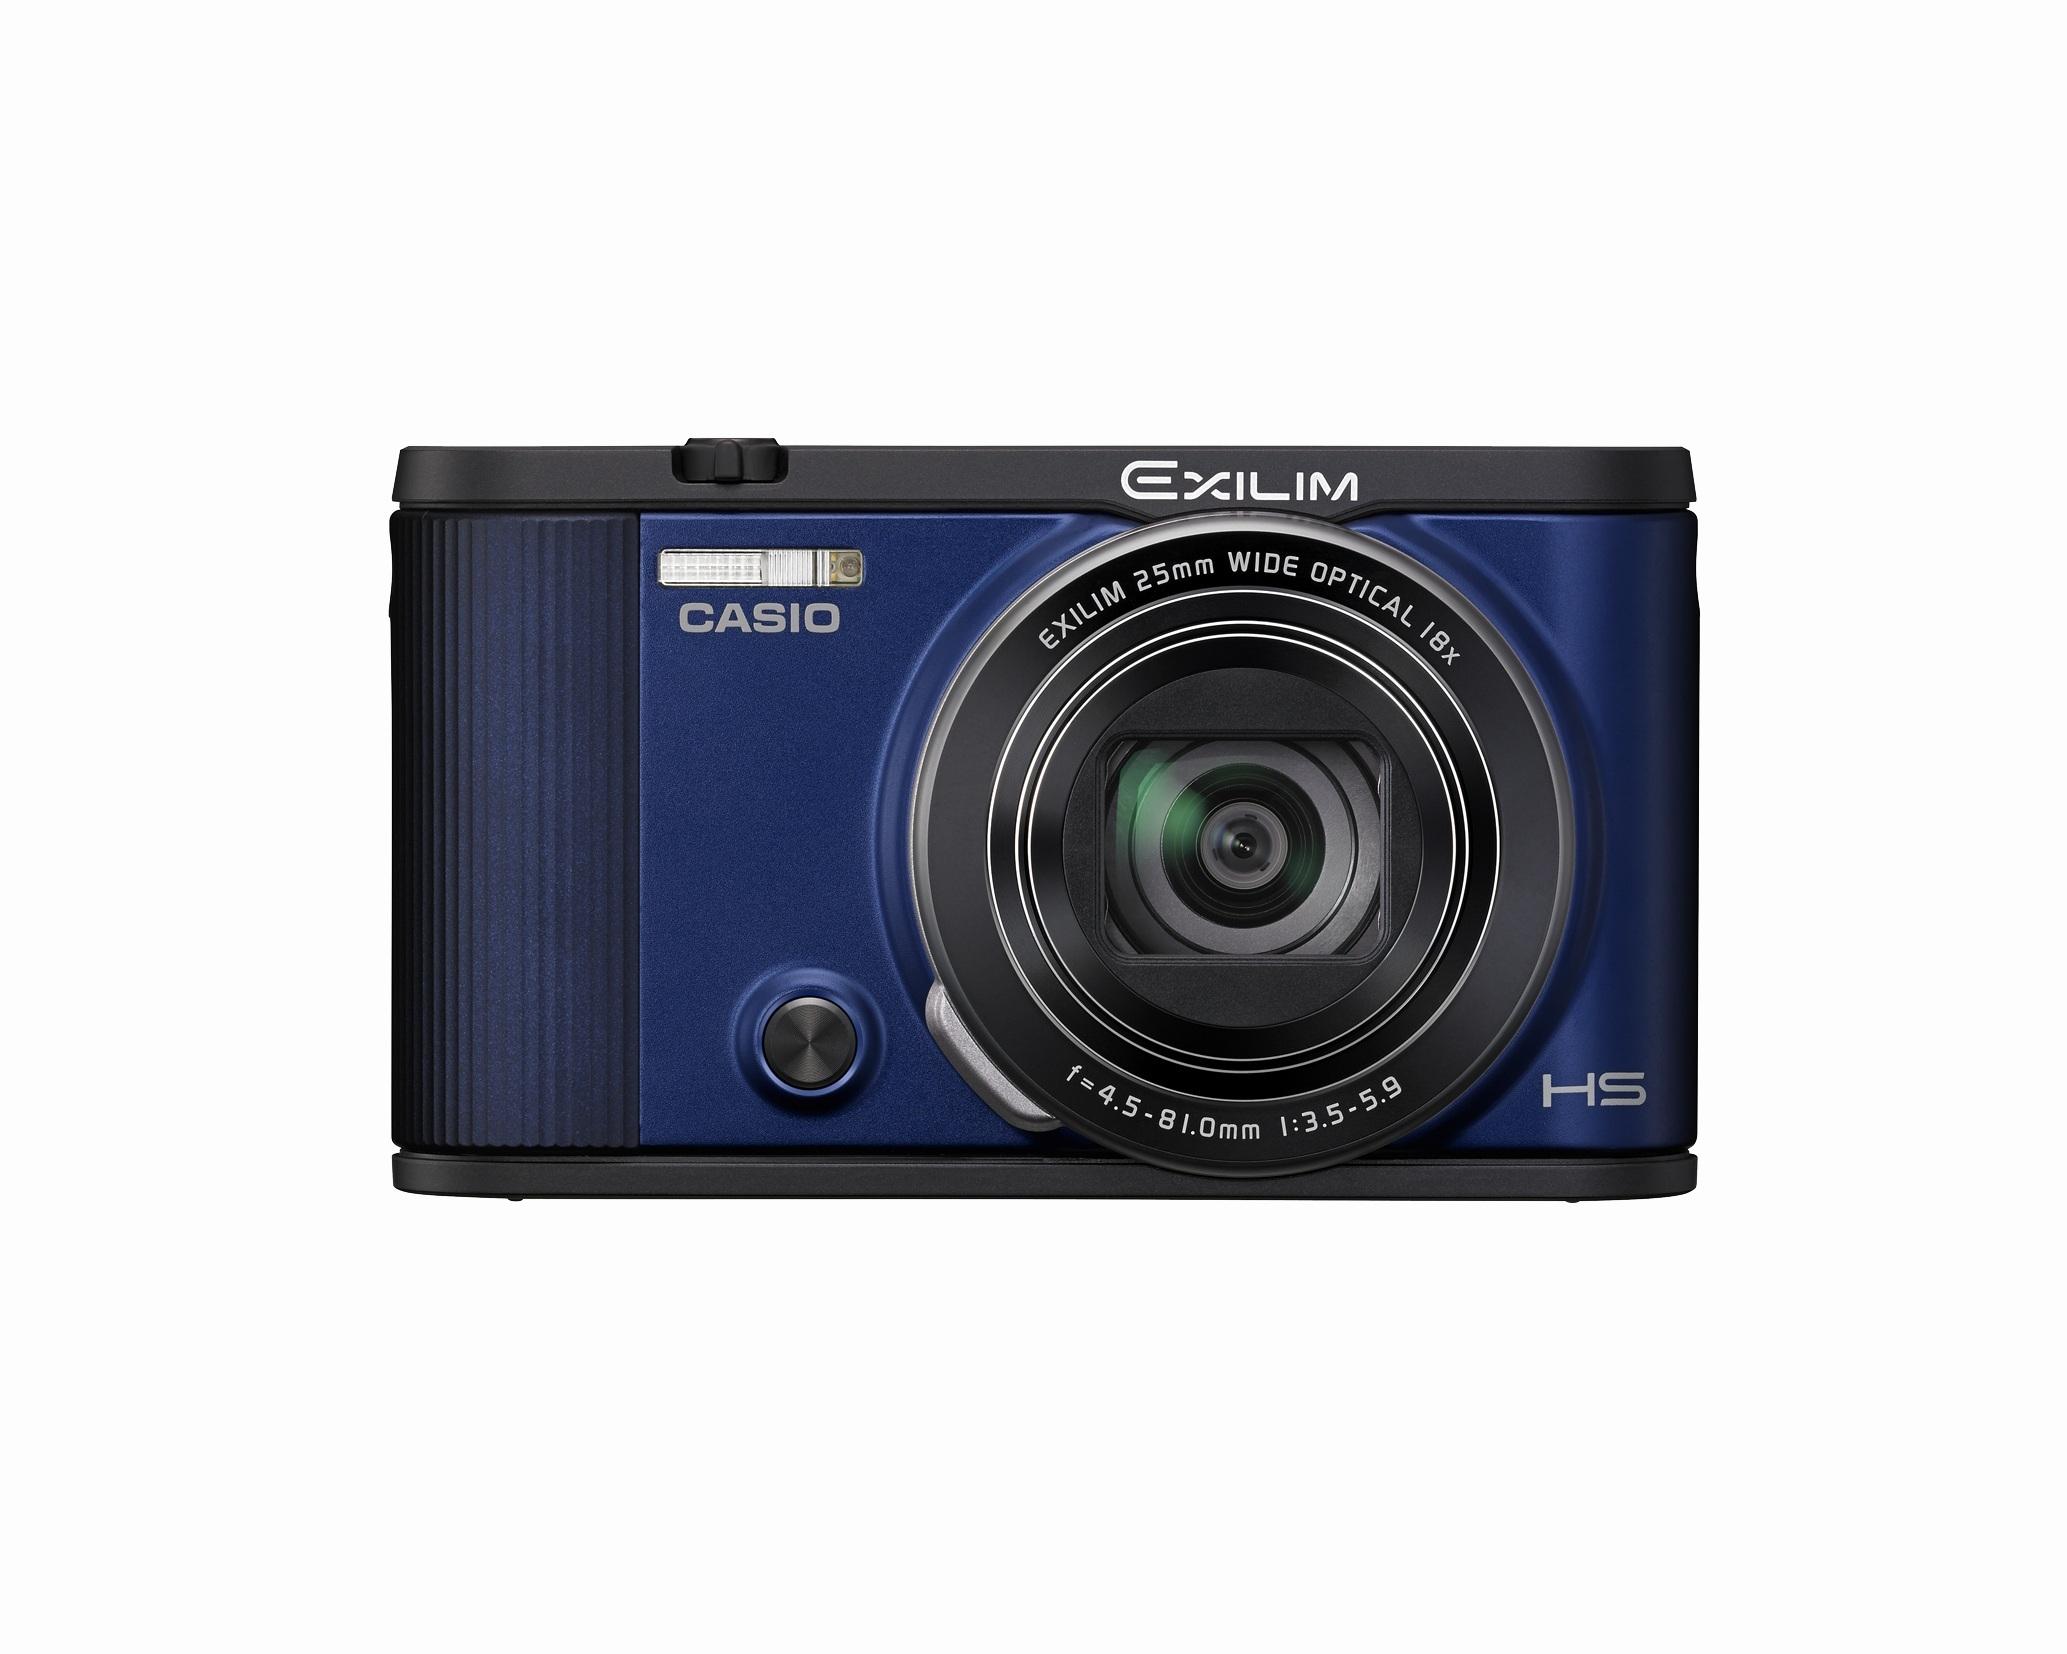 Casio/卡西欧 EX-ZR2000 数码相机好不好用,评价如何